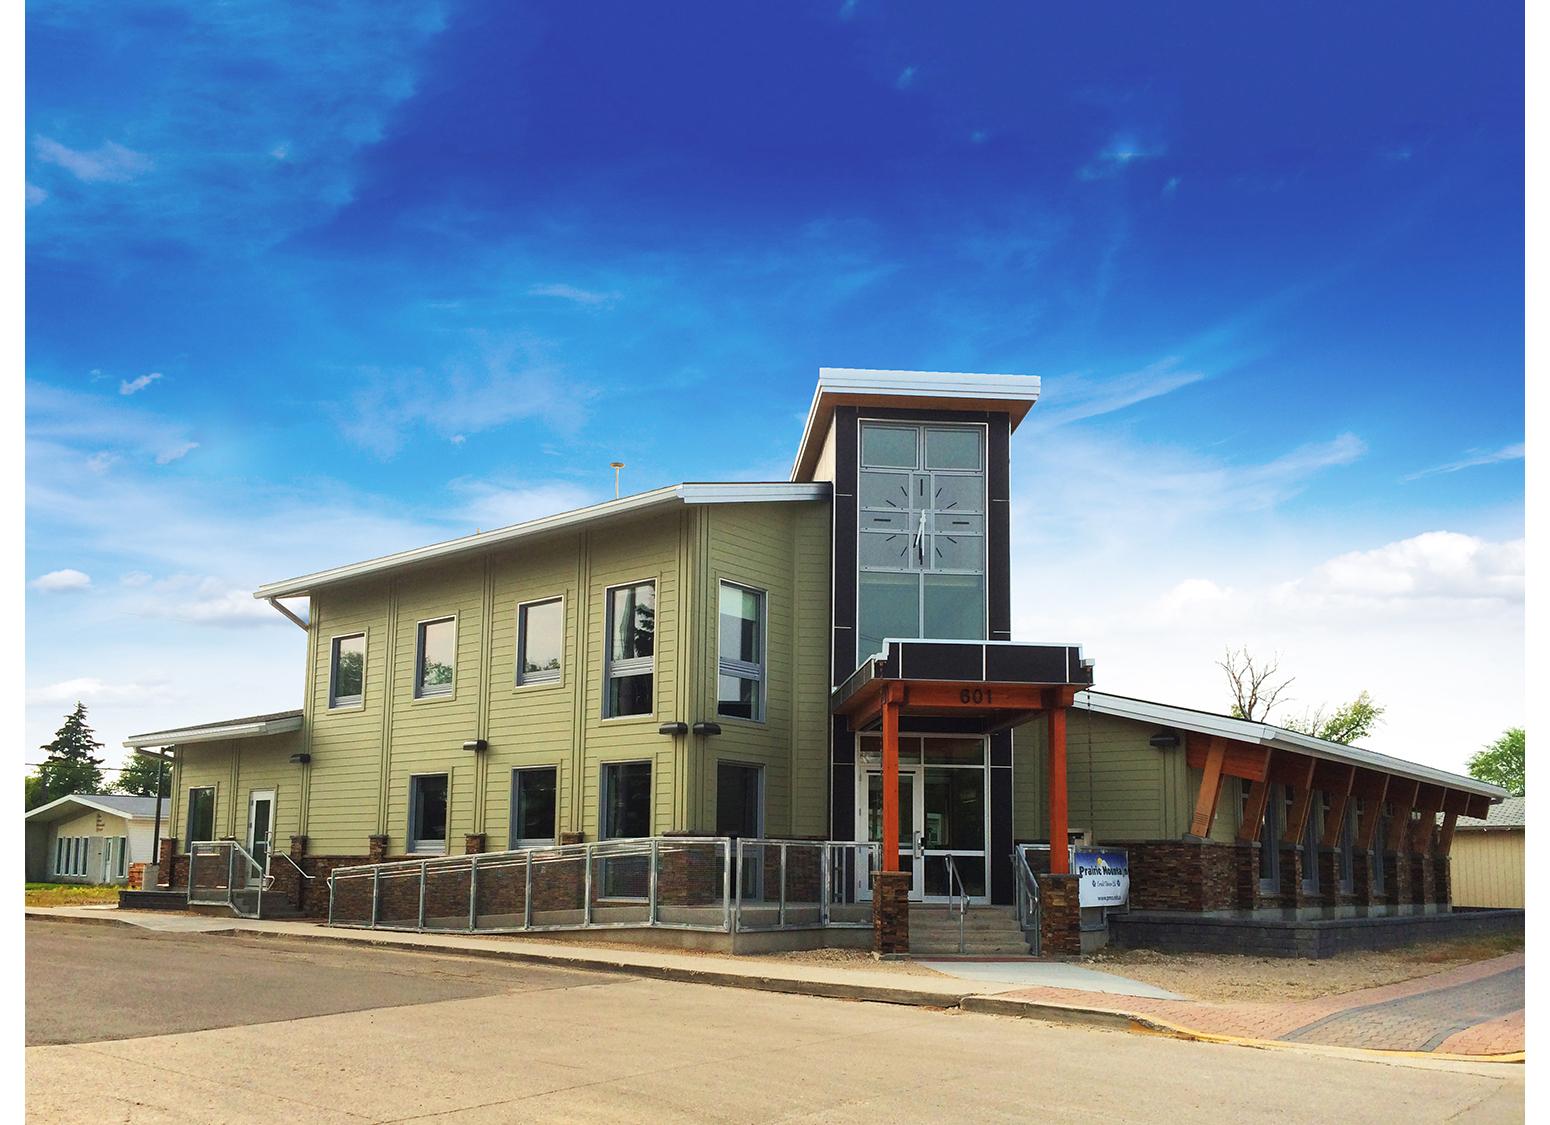 Prairie Mountain Credit Union, exterior photo of building